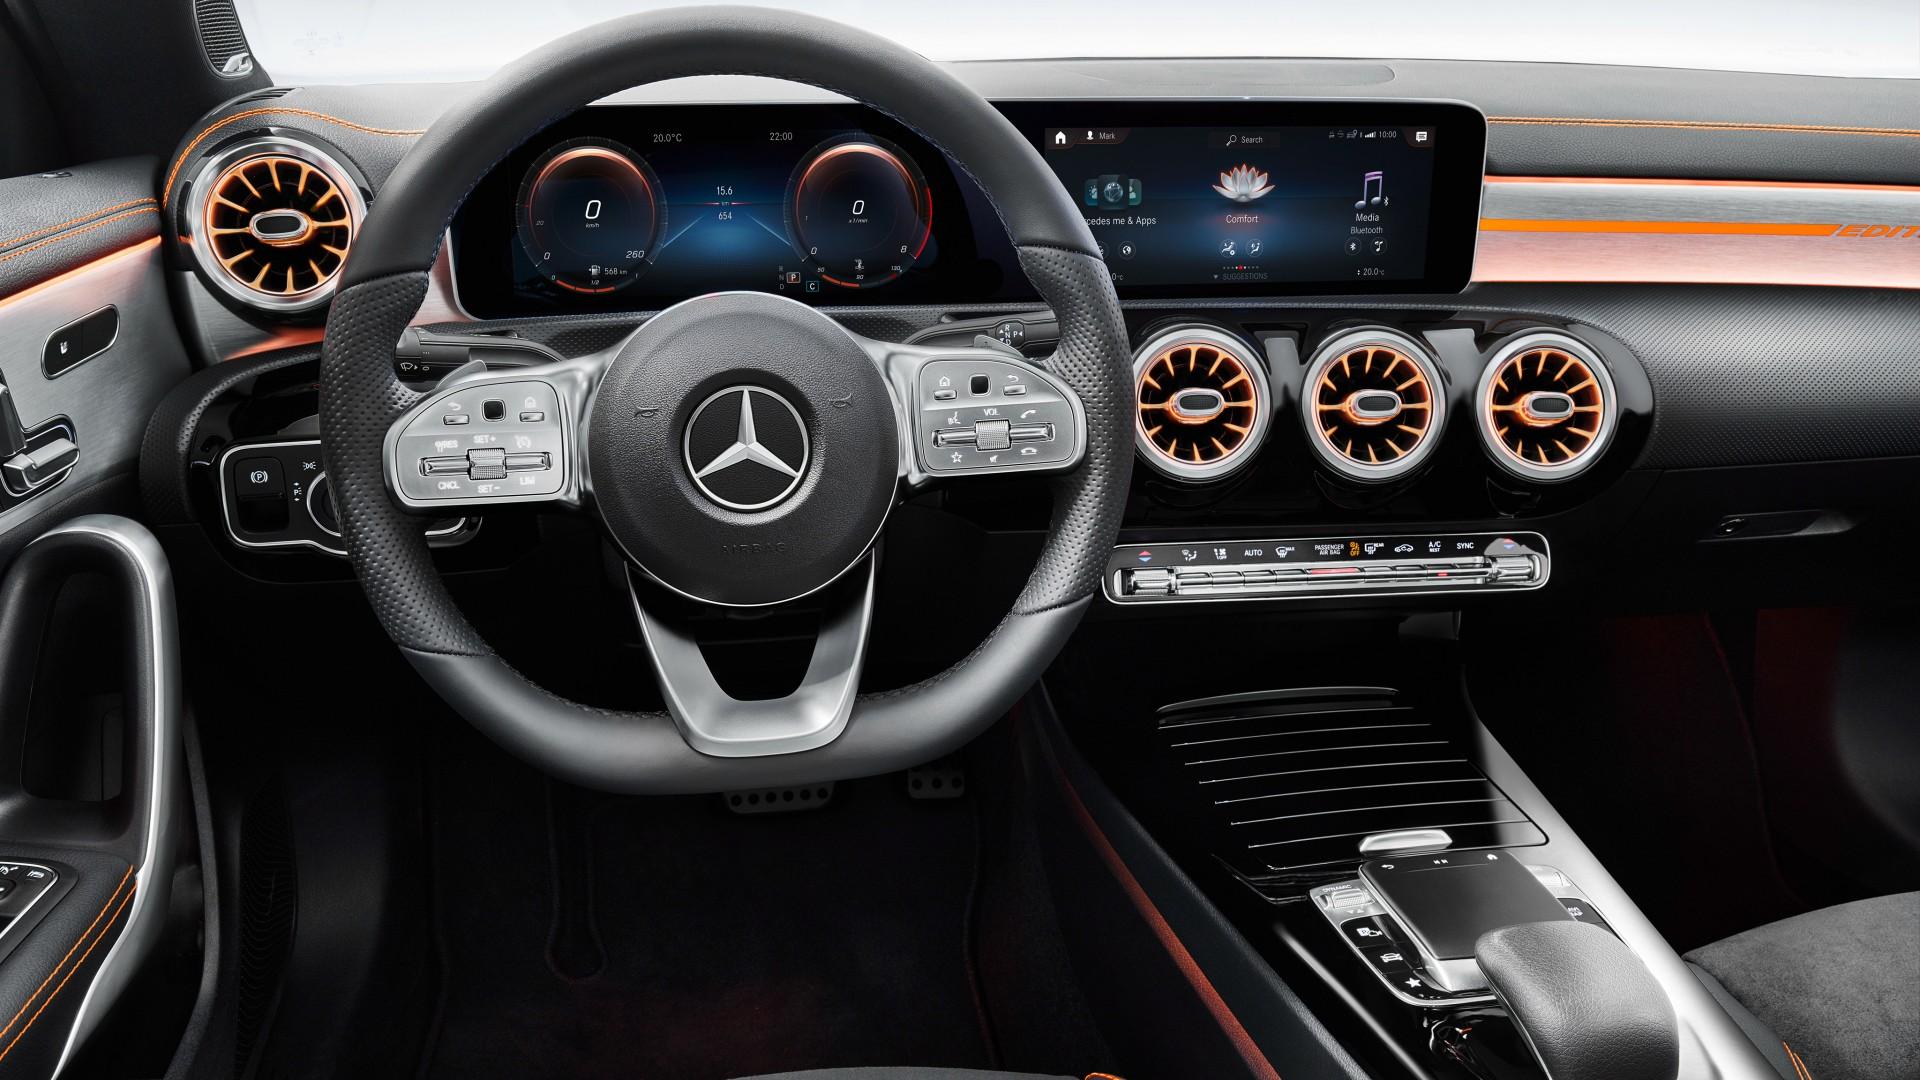 Race Car Wallpaper For Iphone Mercedes Benz Cla 250 Amg Line Edition Orange Art 2019 4k